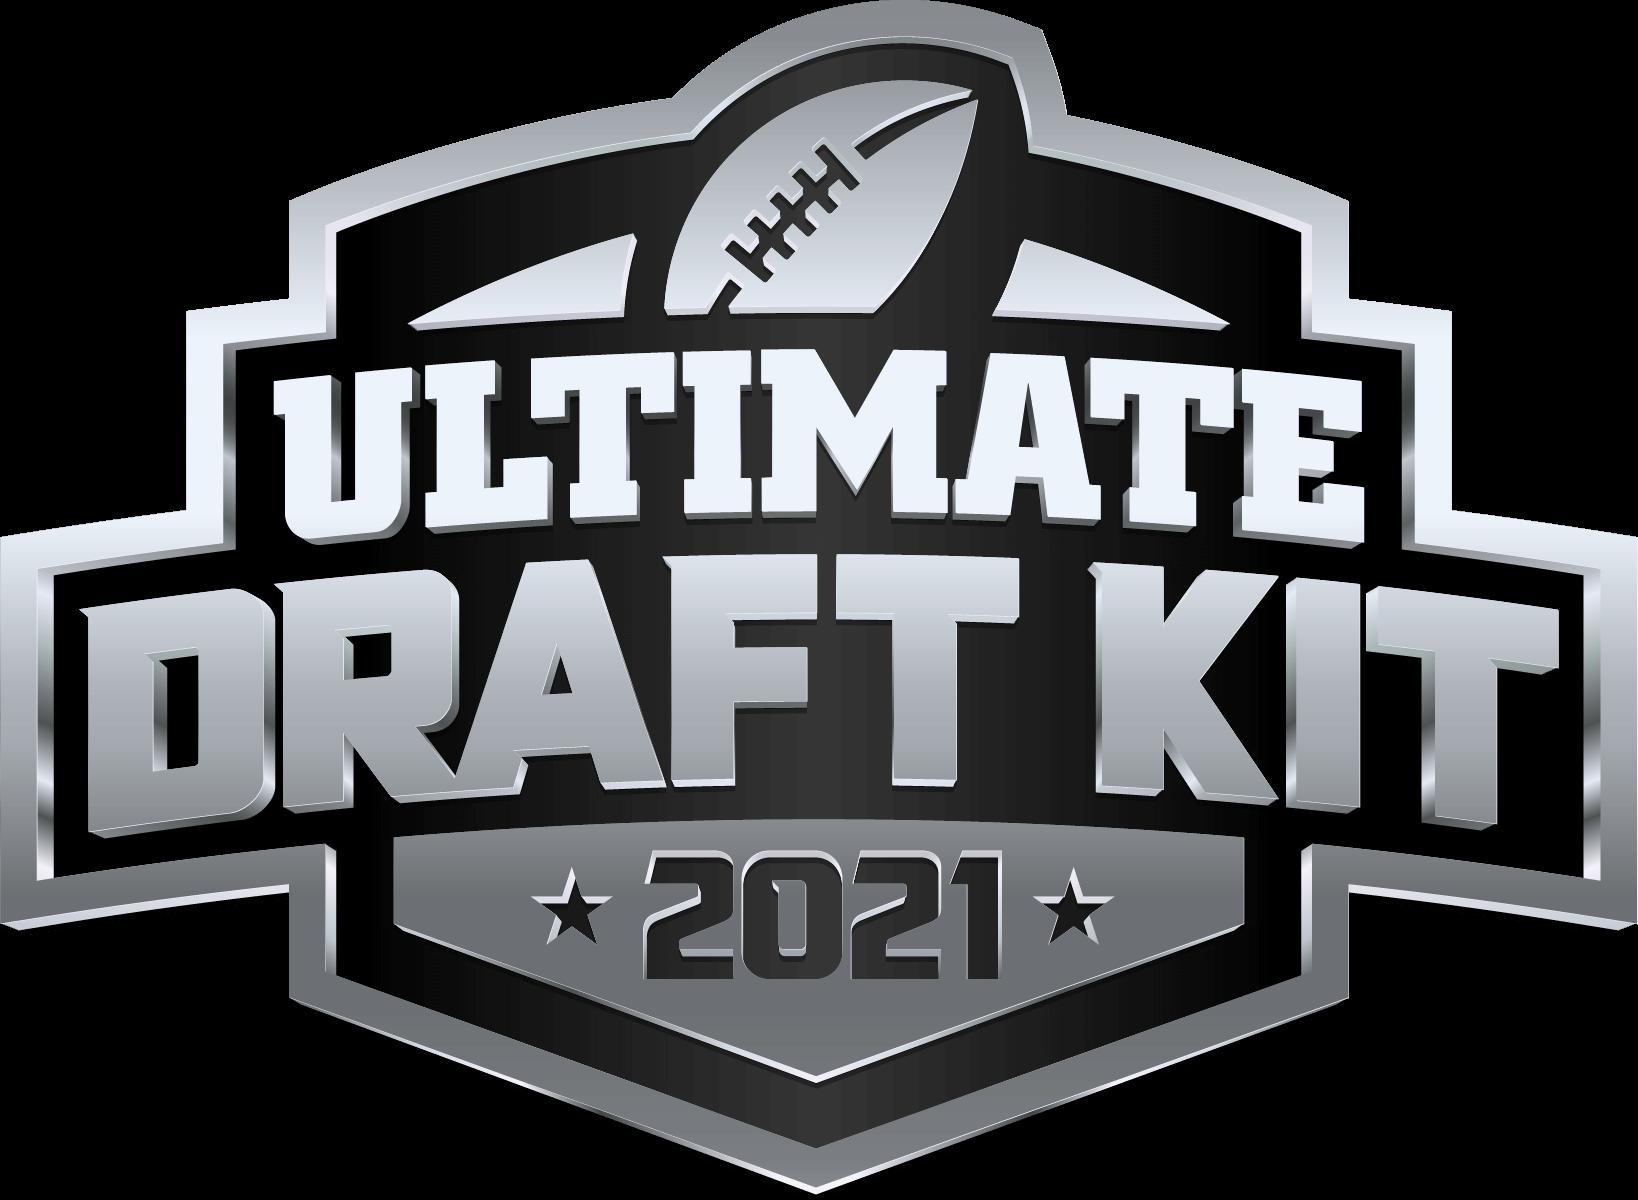 2021 Fantasy Football Draft Kit